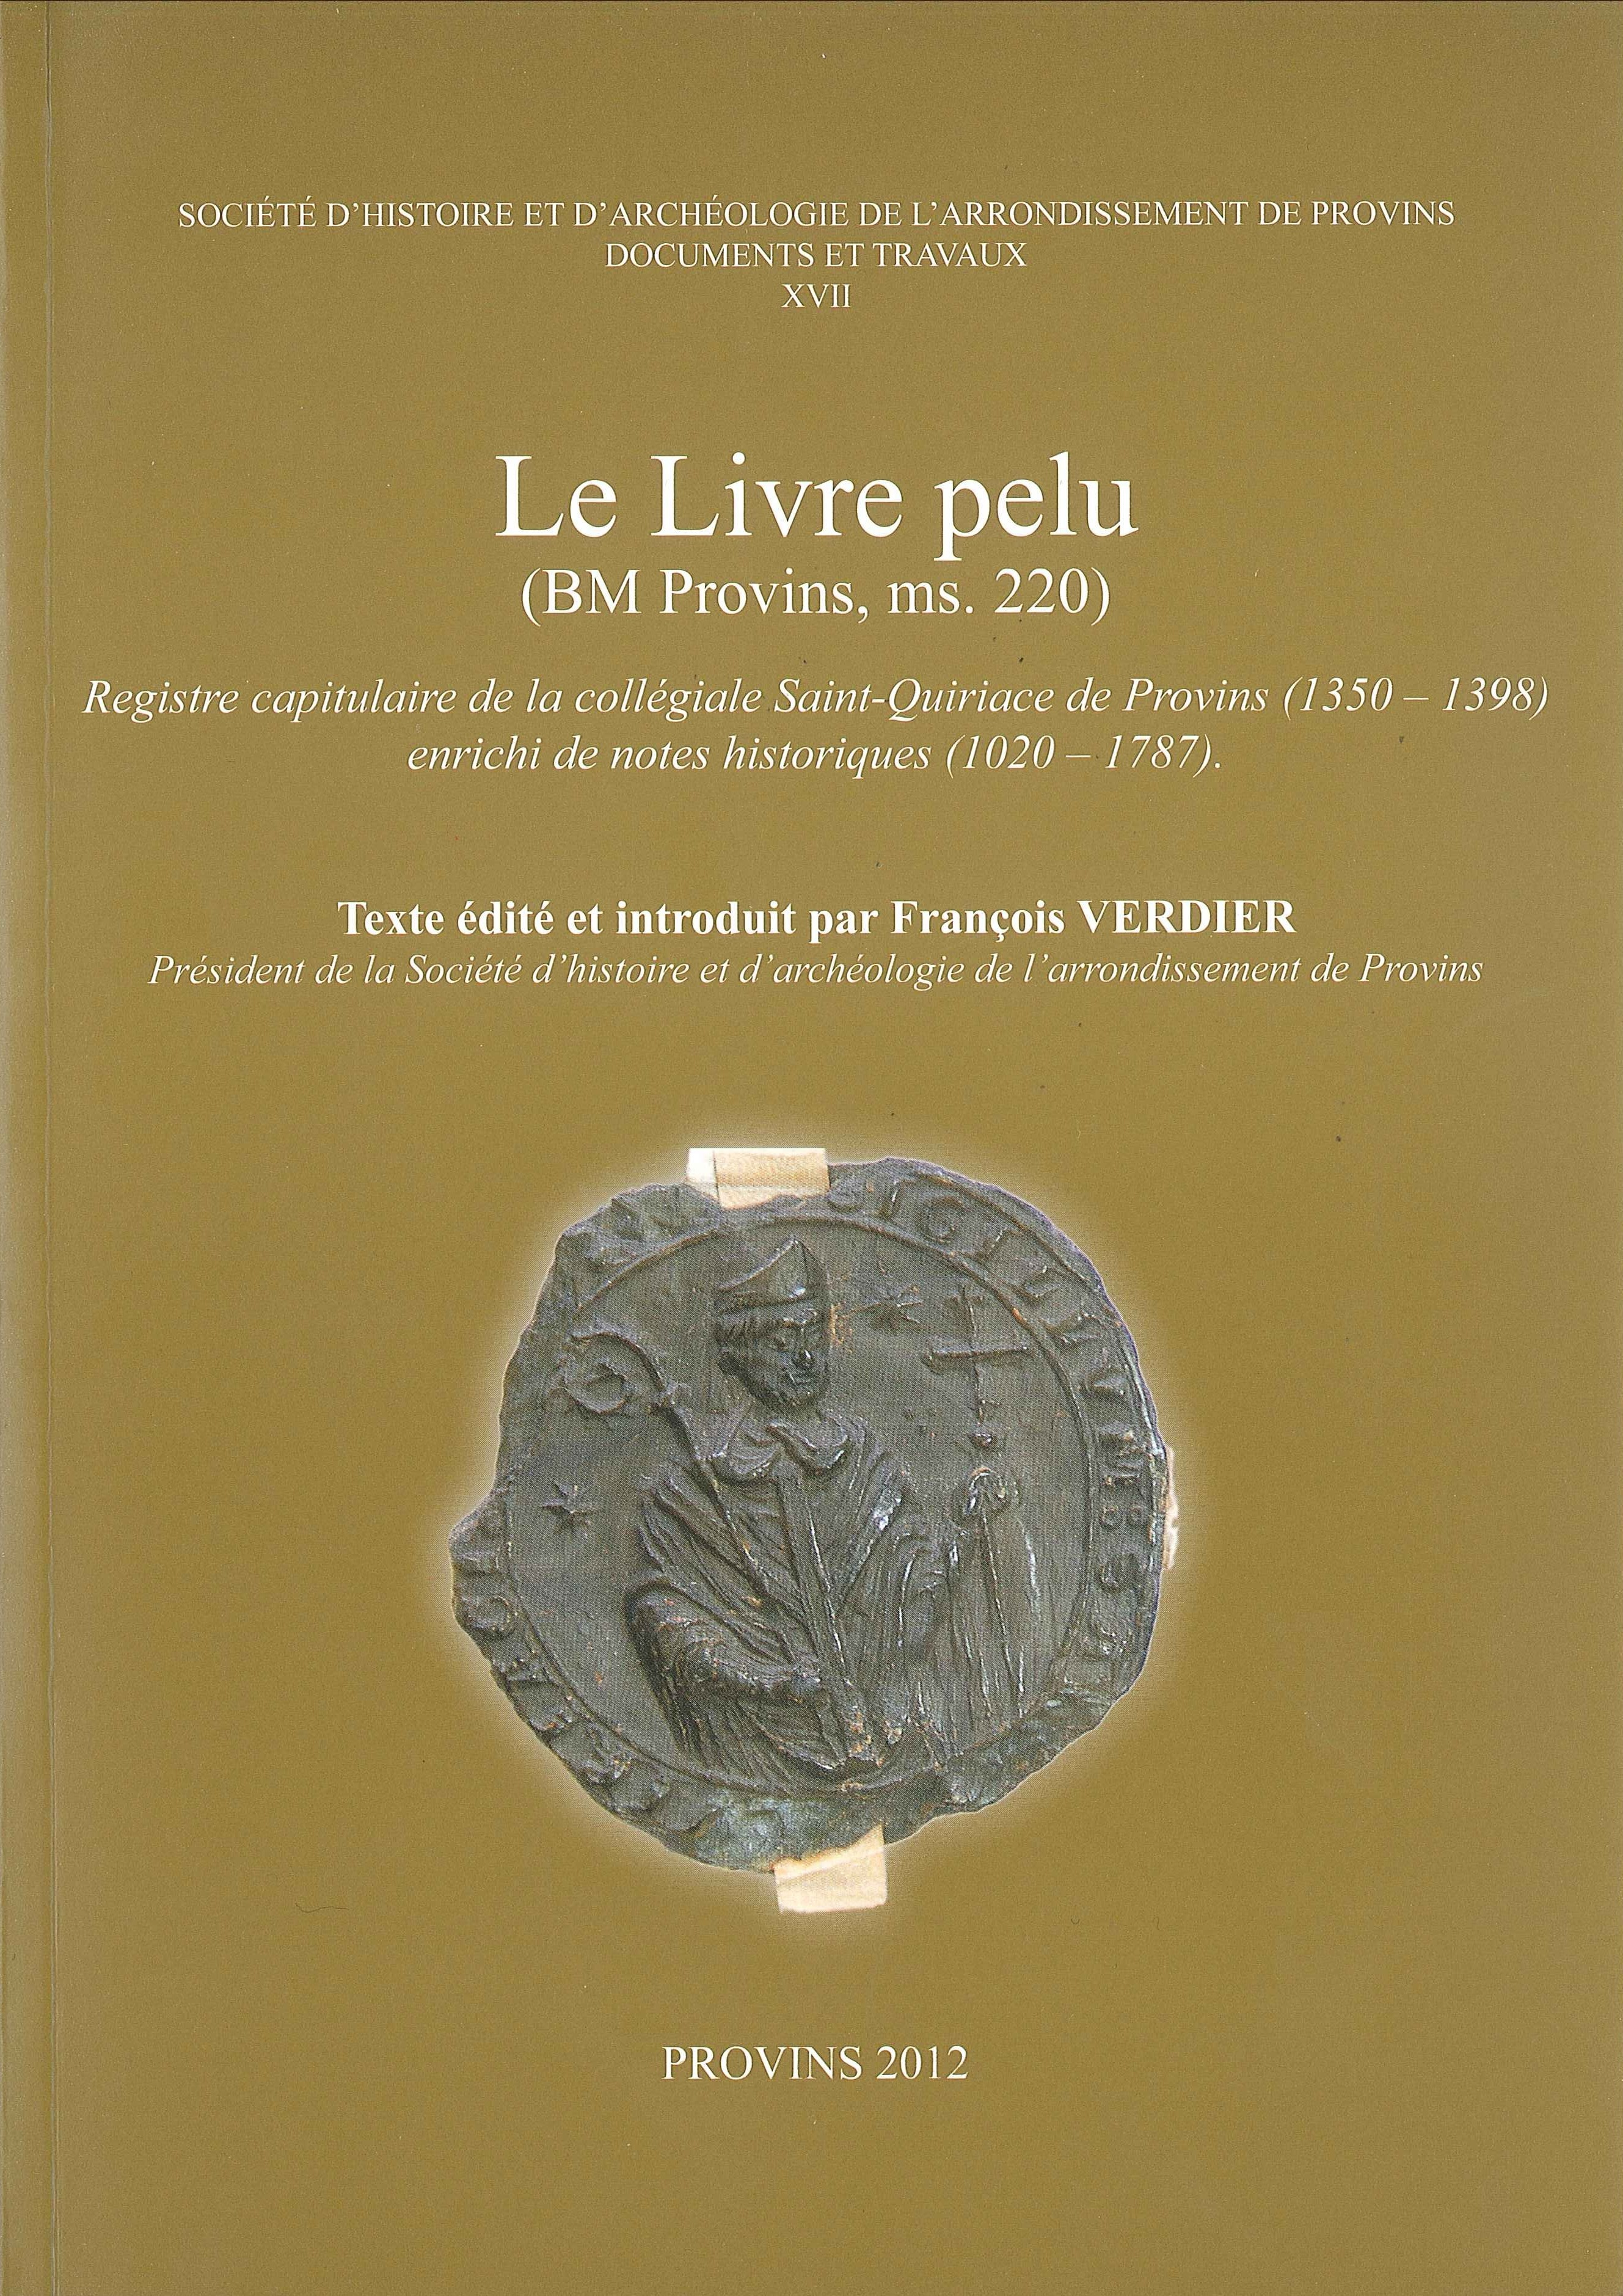 LE LIVRE PELU (BM PROVINS, MS. 220)